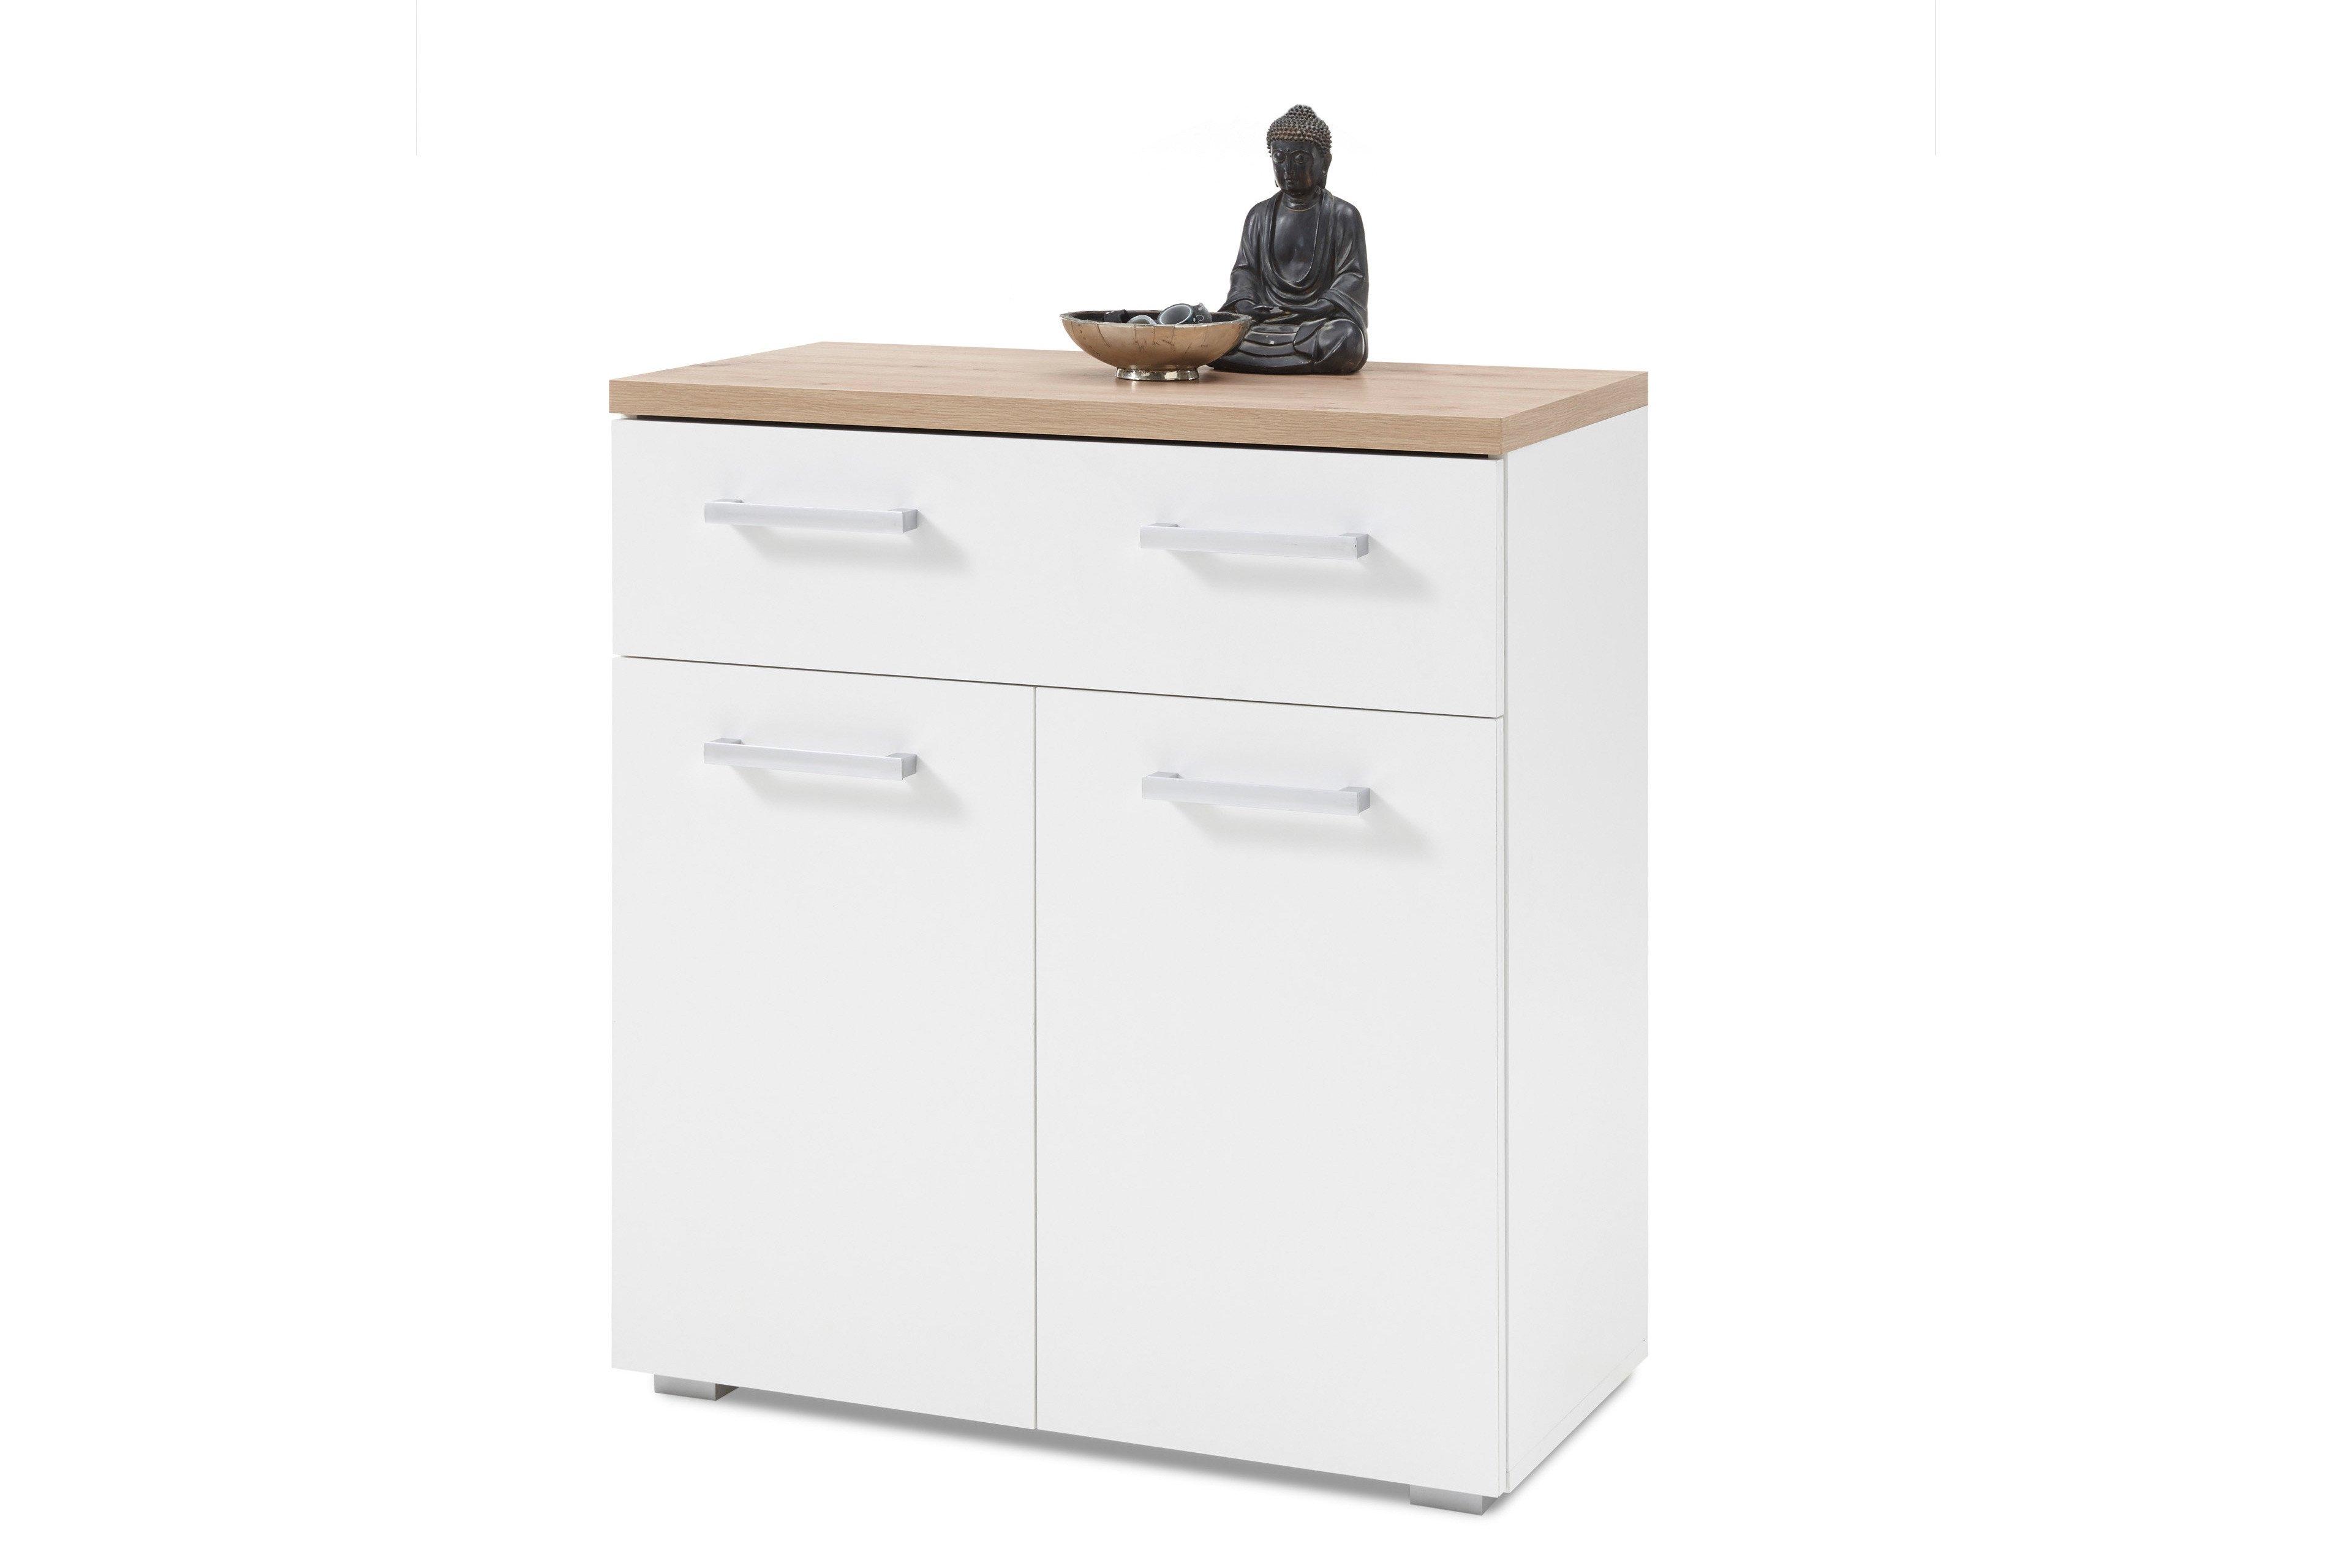 Cabinet din pal cu 1 sertar si 2 usi Gota Alb / Natural, l78xA38xH85 cm